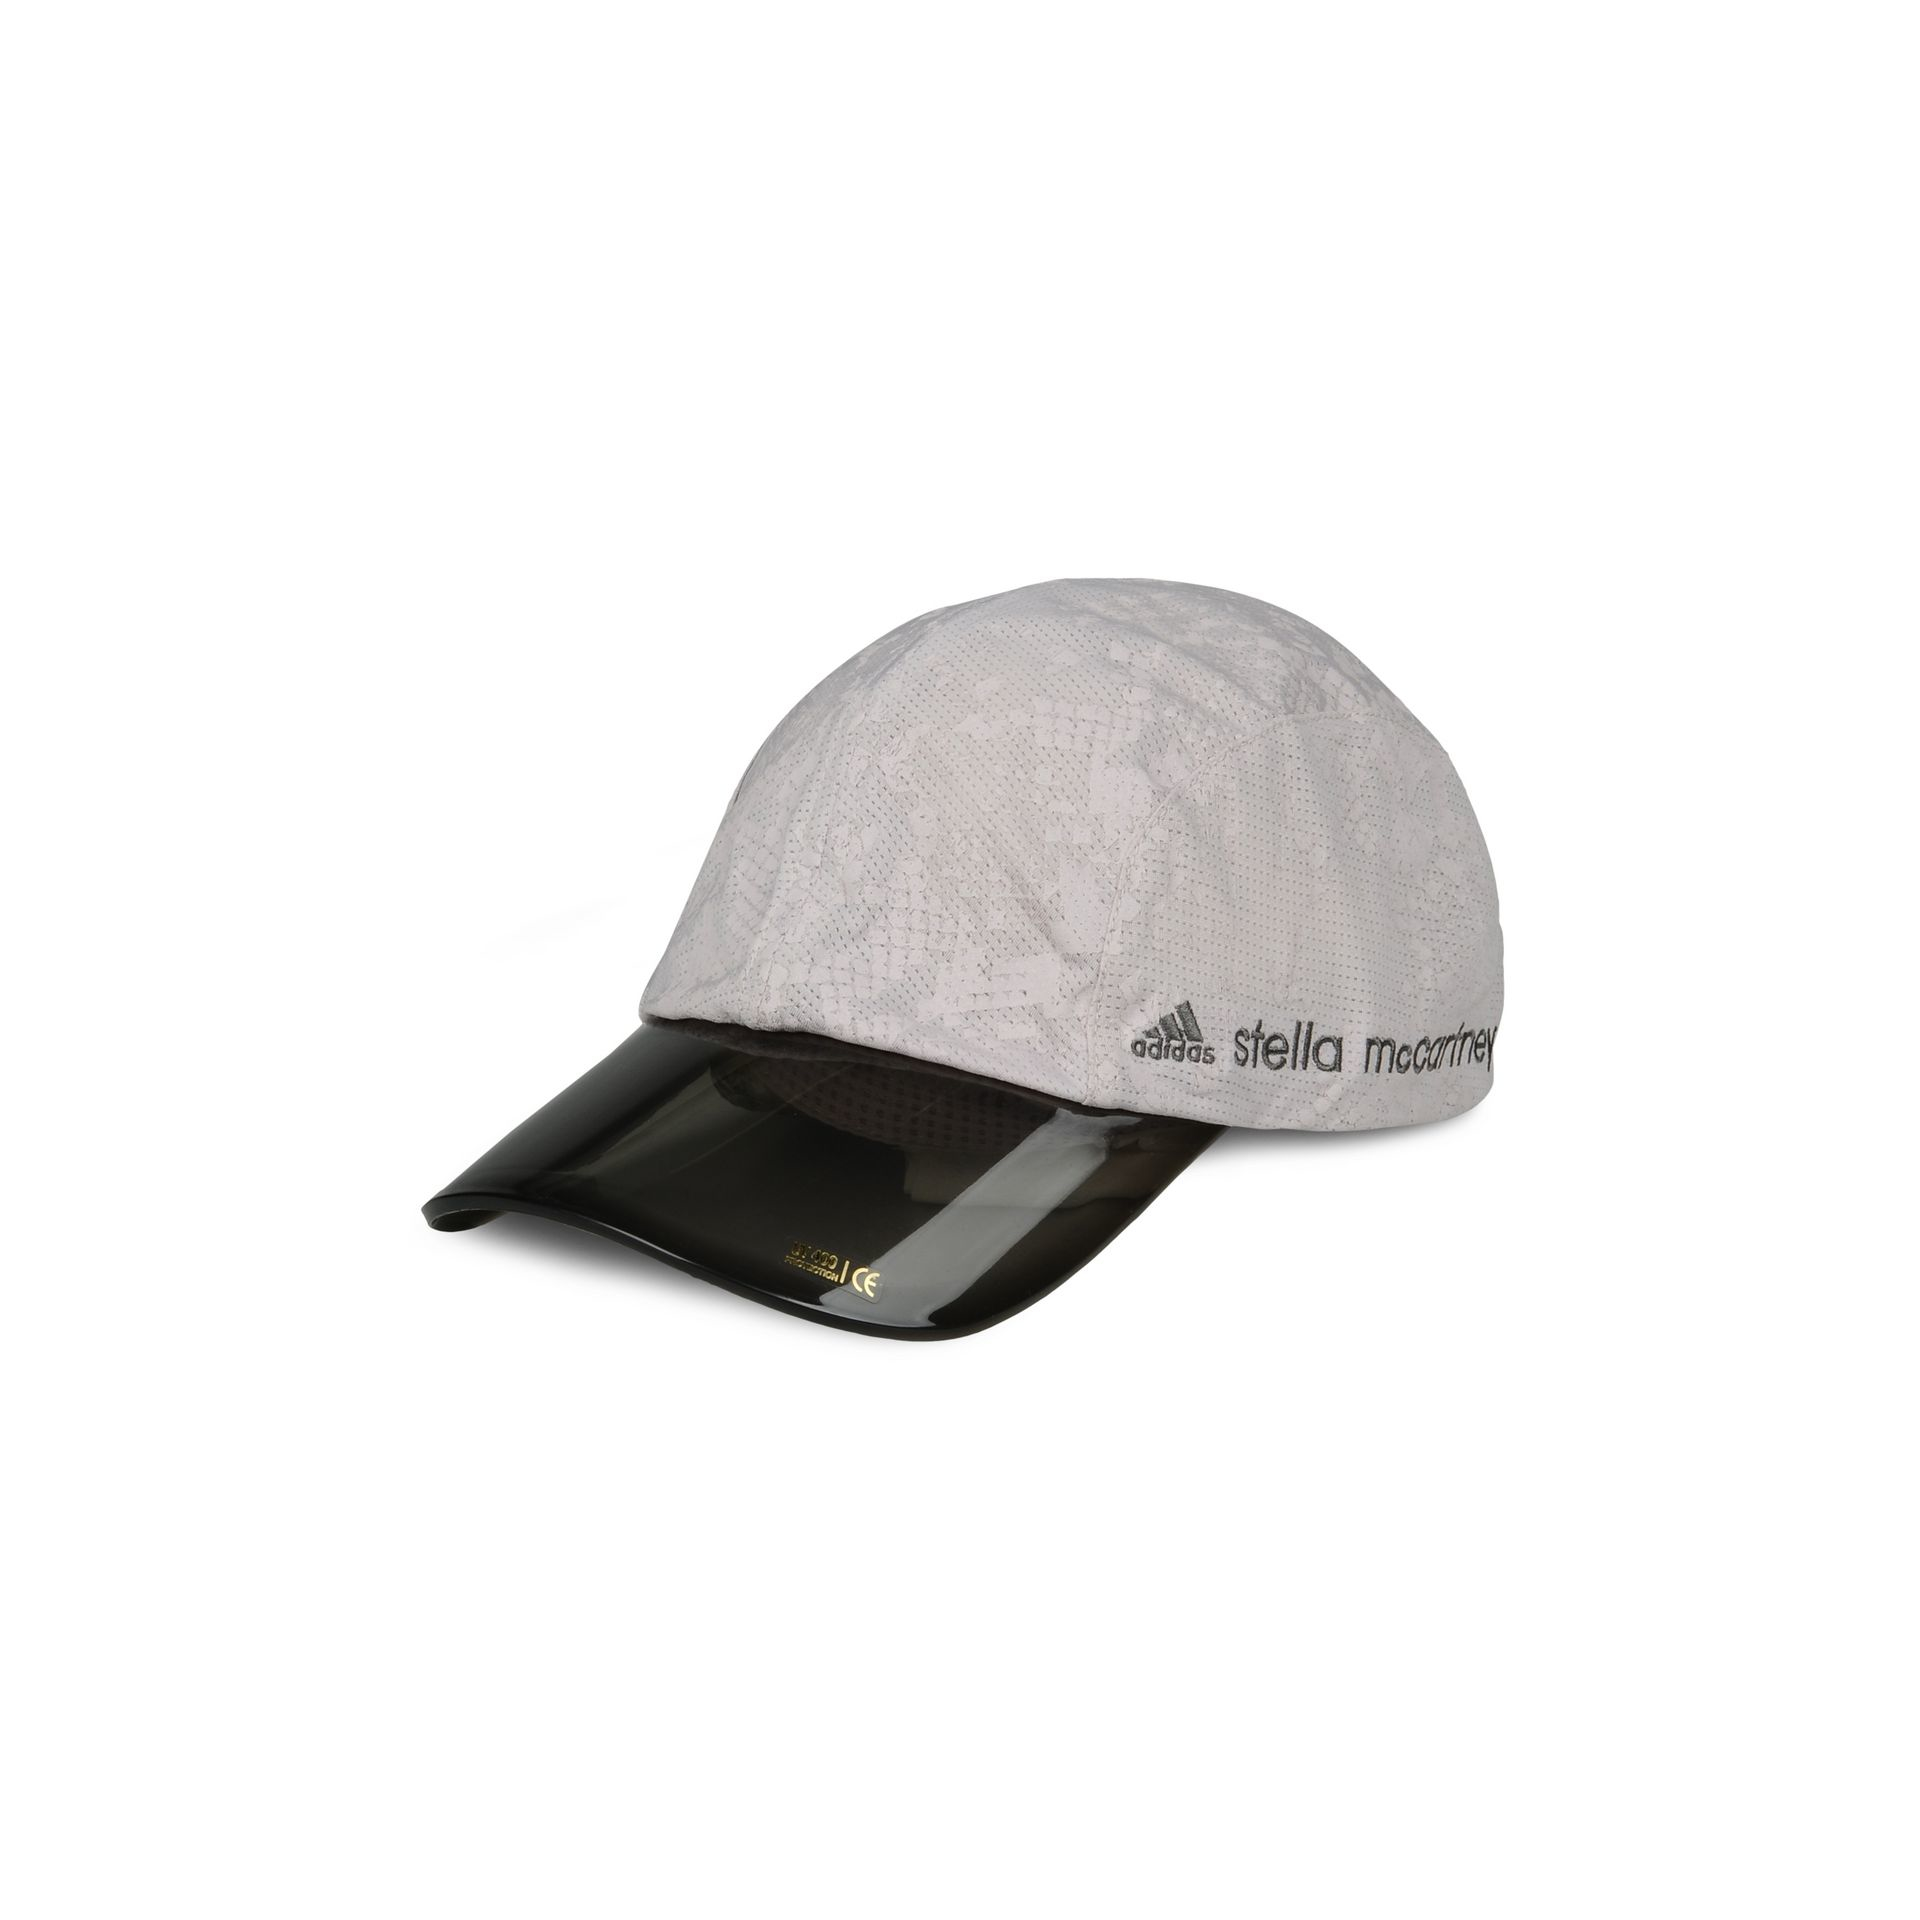 22a89c225e1 Adidas By Stella Mccartney Pink Run Cap in White - Lyst